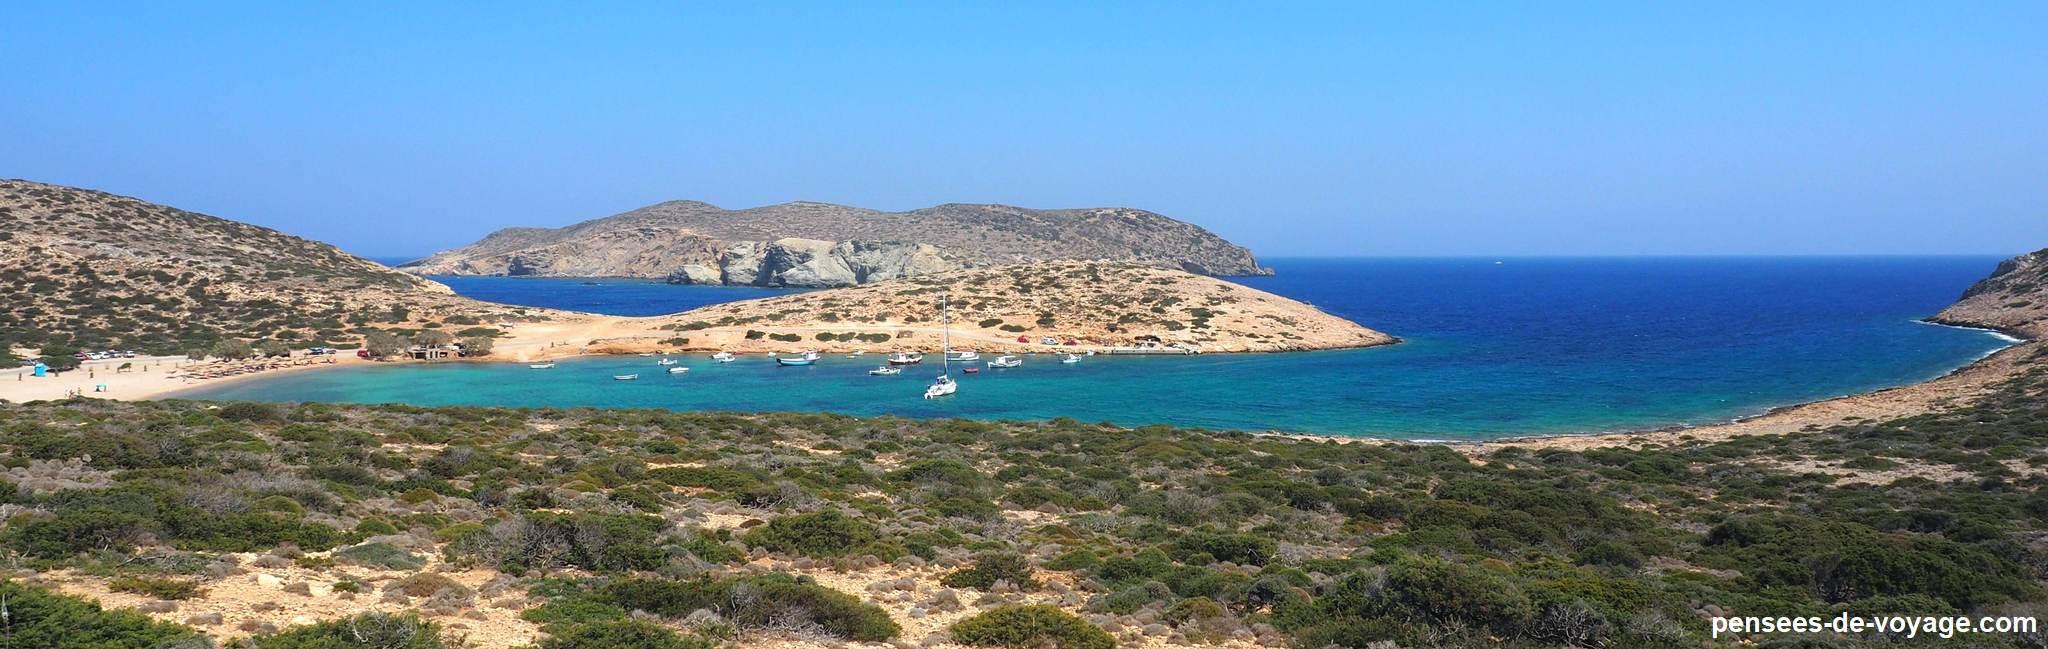 plage de Kalotaritisa